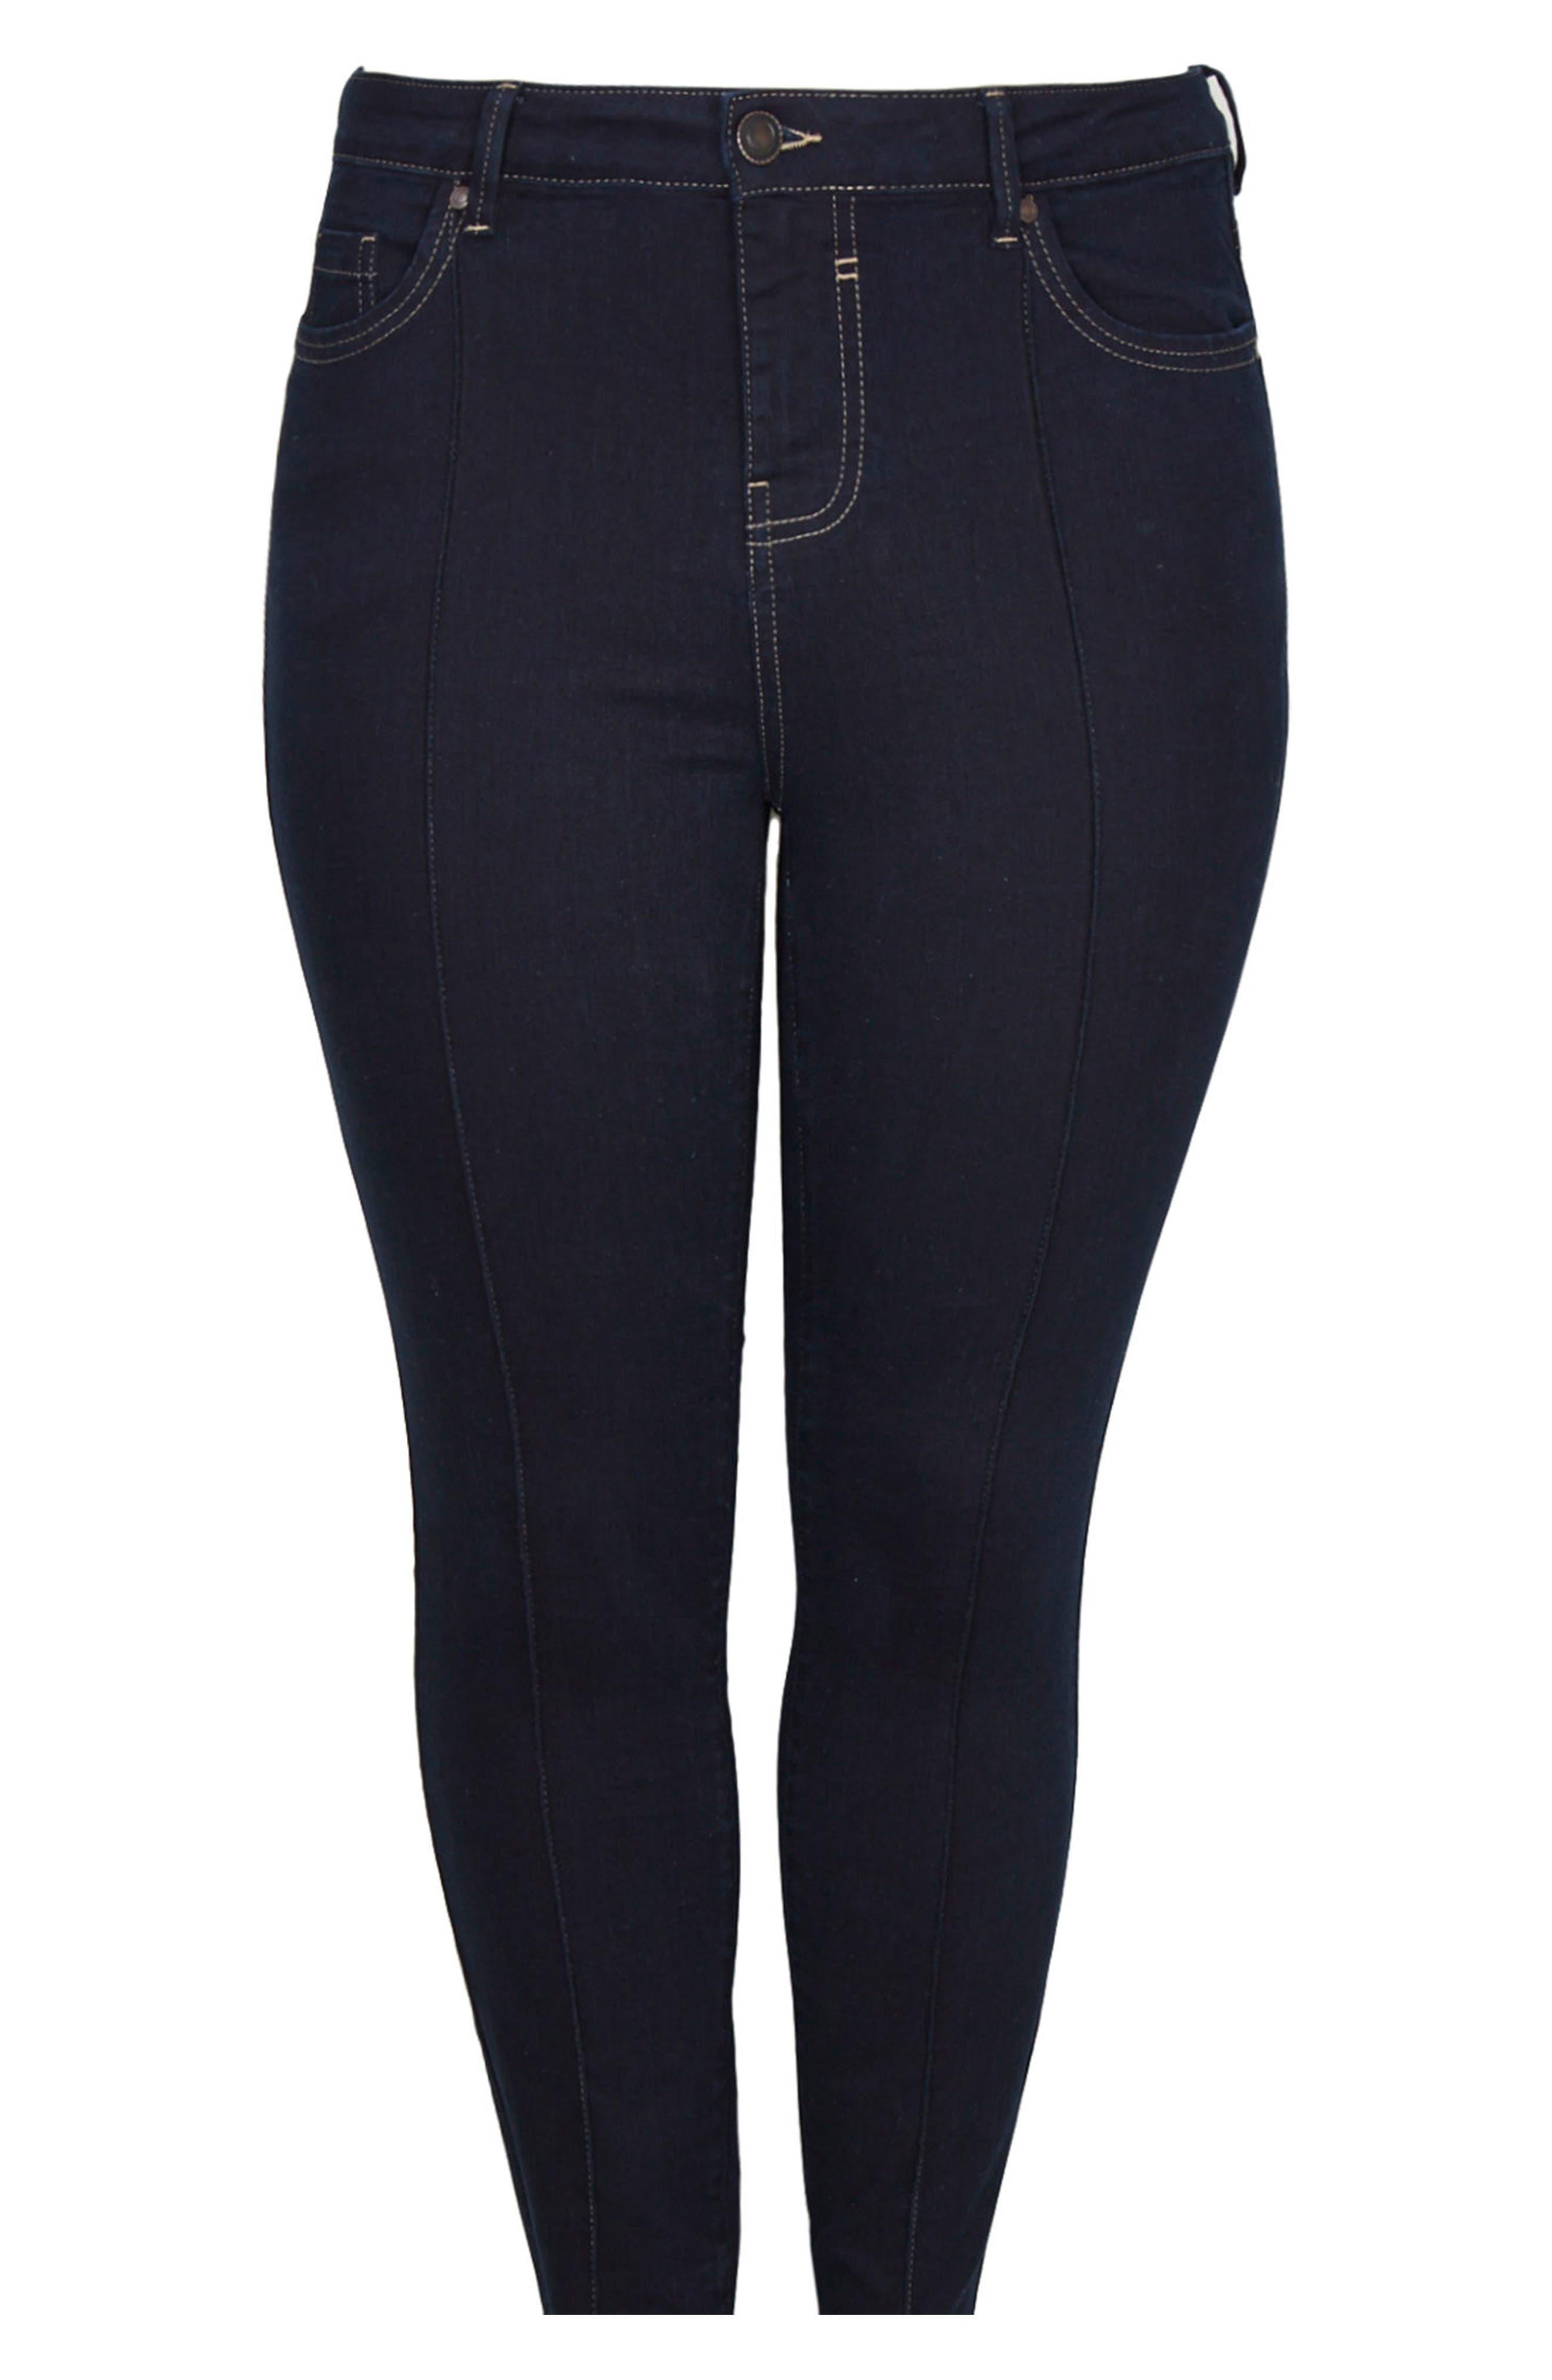 Pintuck High Waist Skinny Jeans,                             Alternate thumbnail 5, color,                             Indigo